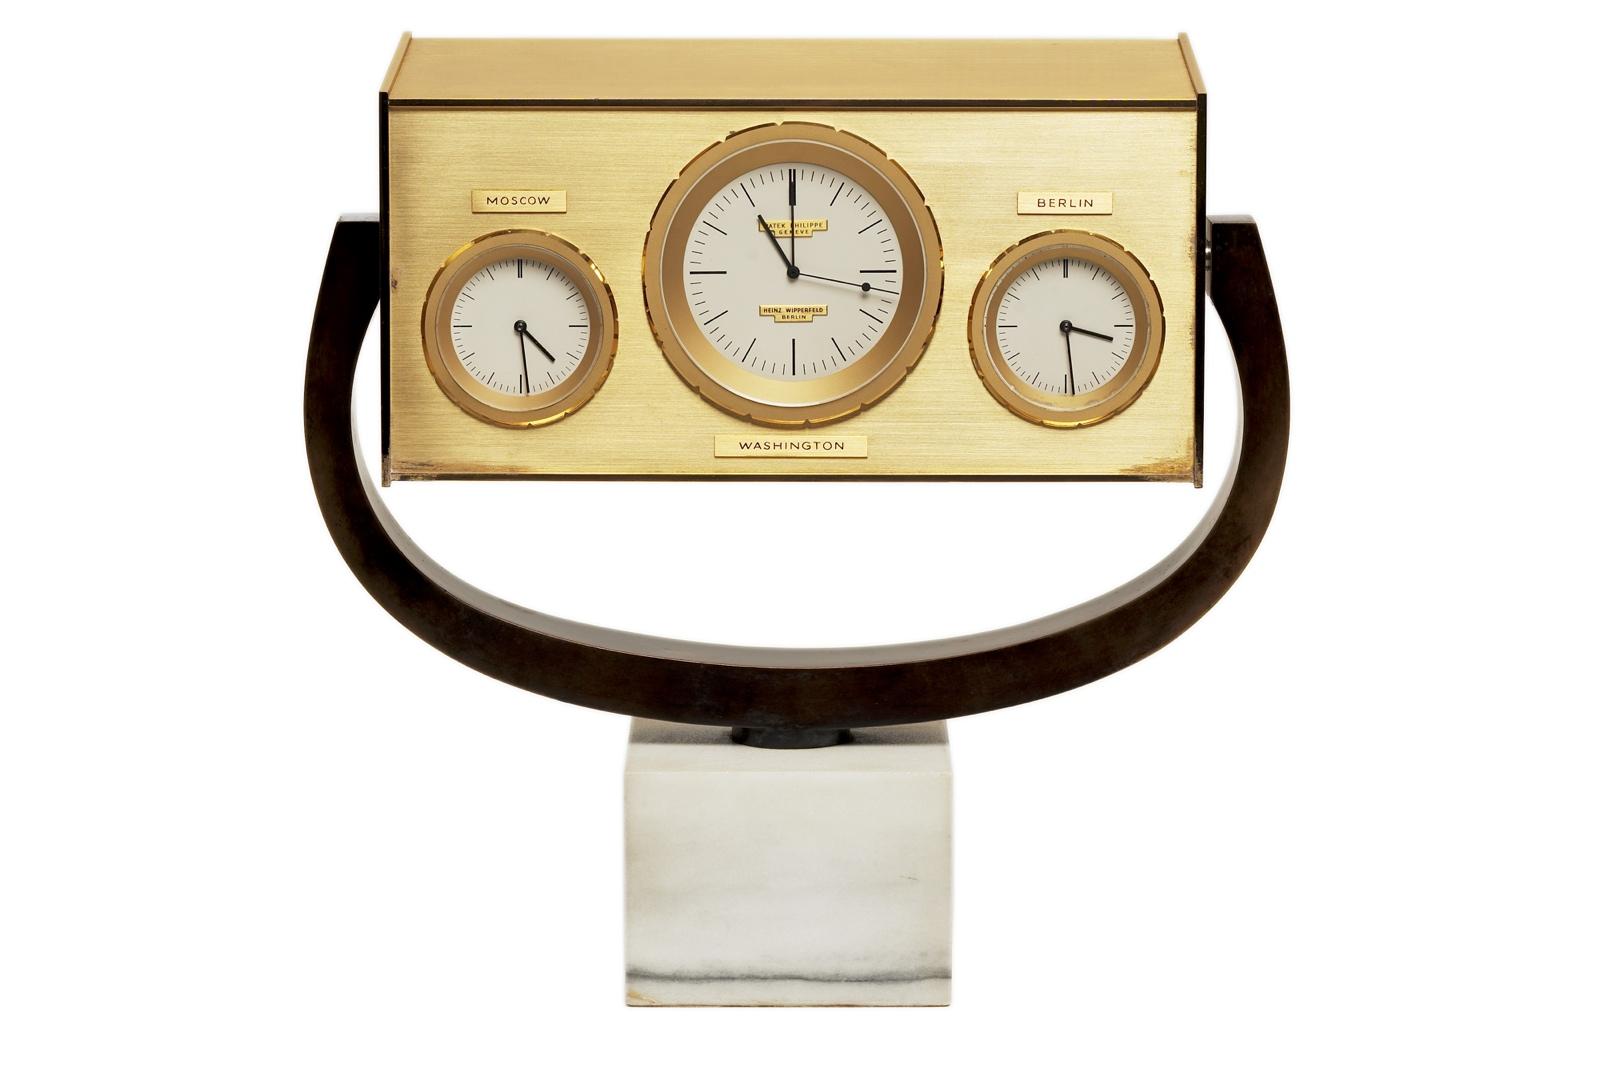 Patek Philippe en New York - John F. Kennedy clock (1963)